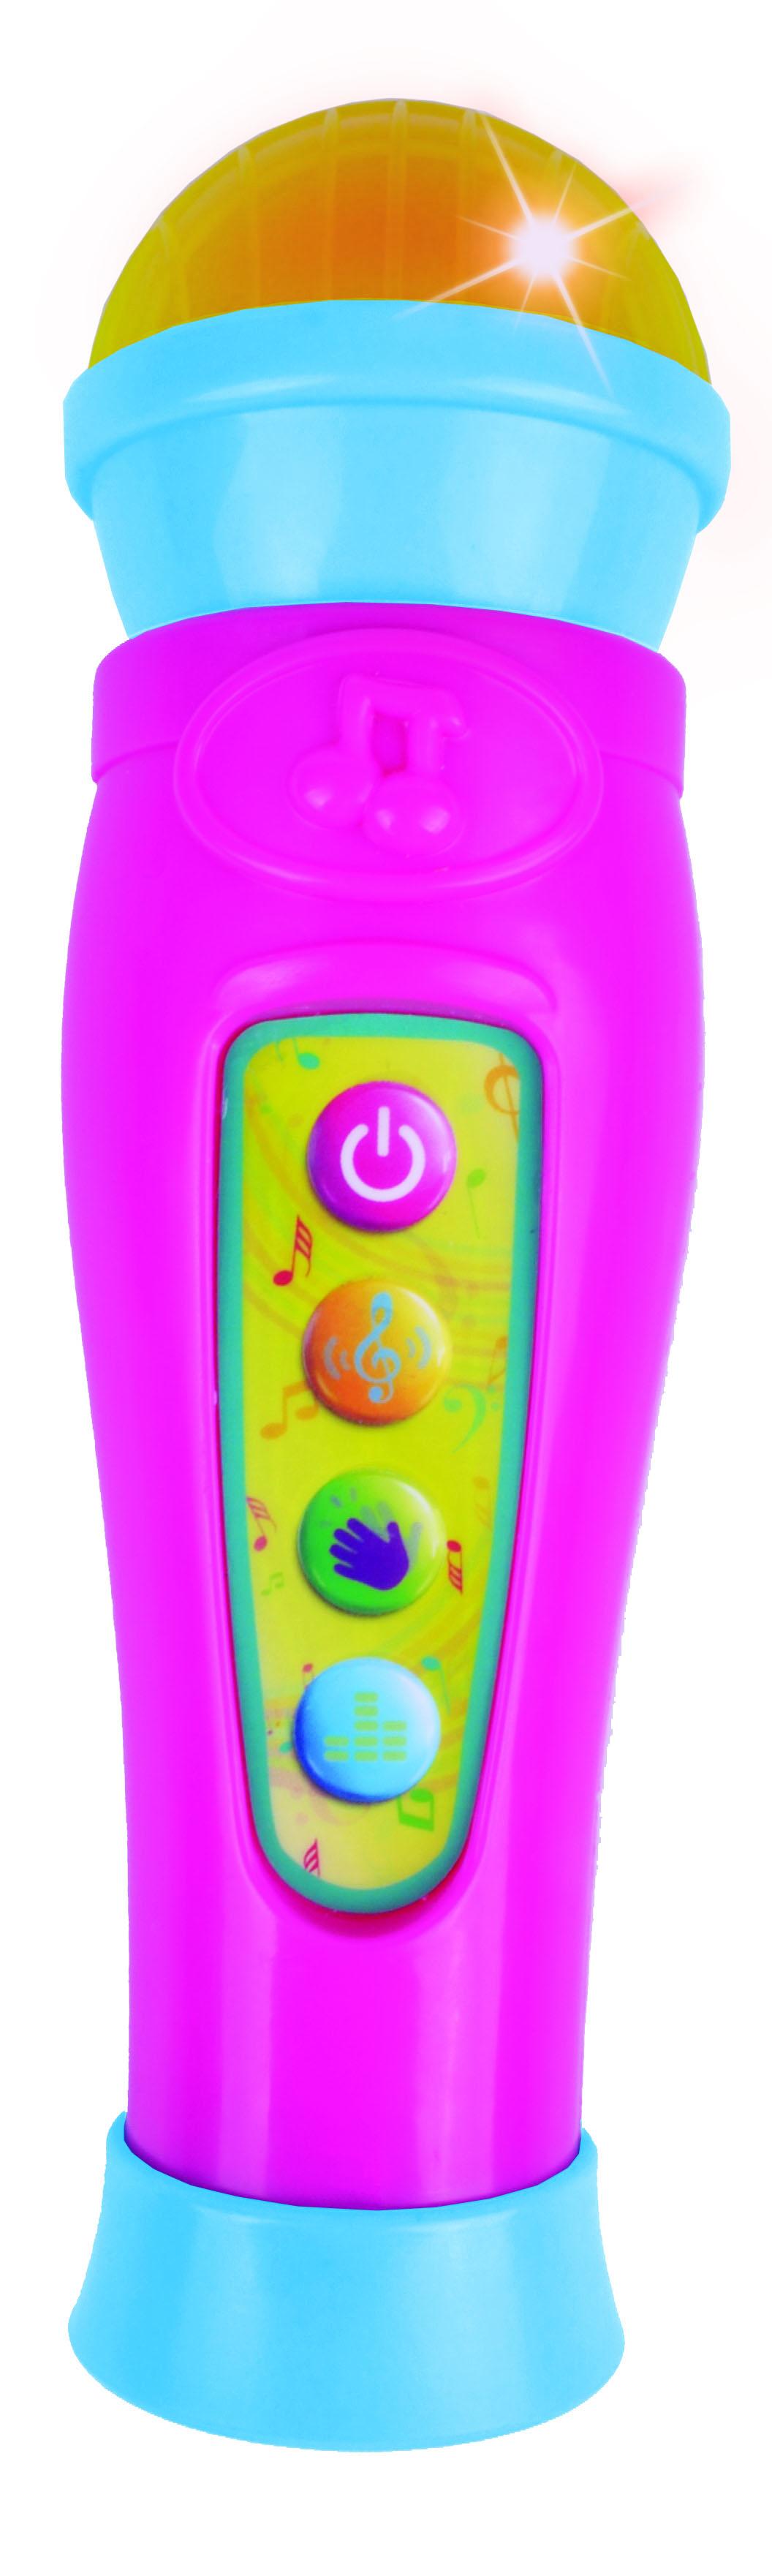 Музыкальная игрушка Red Box 25772 розовый, голубой, желтый x96 italy iptv germany iptv box with android box 6 0 4k amlogic smart tv 3000 albania french turkey uk adult set top box